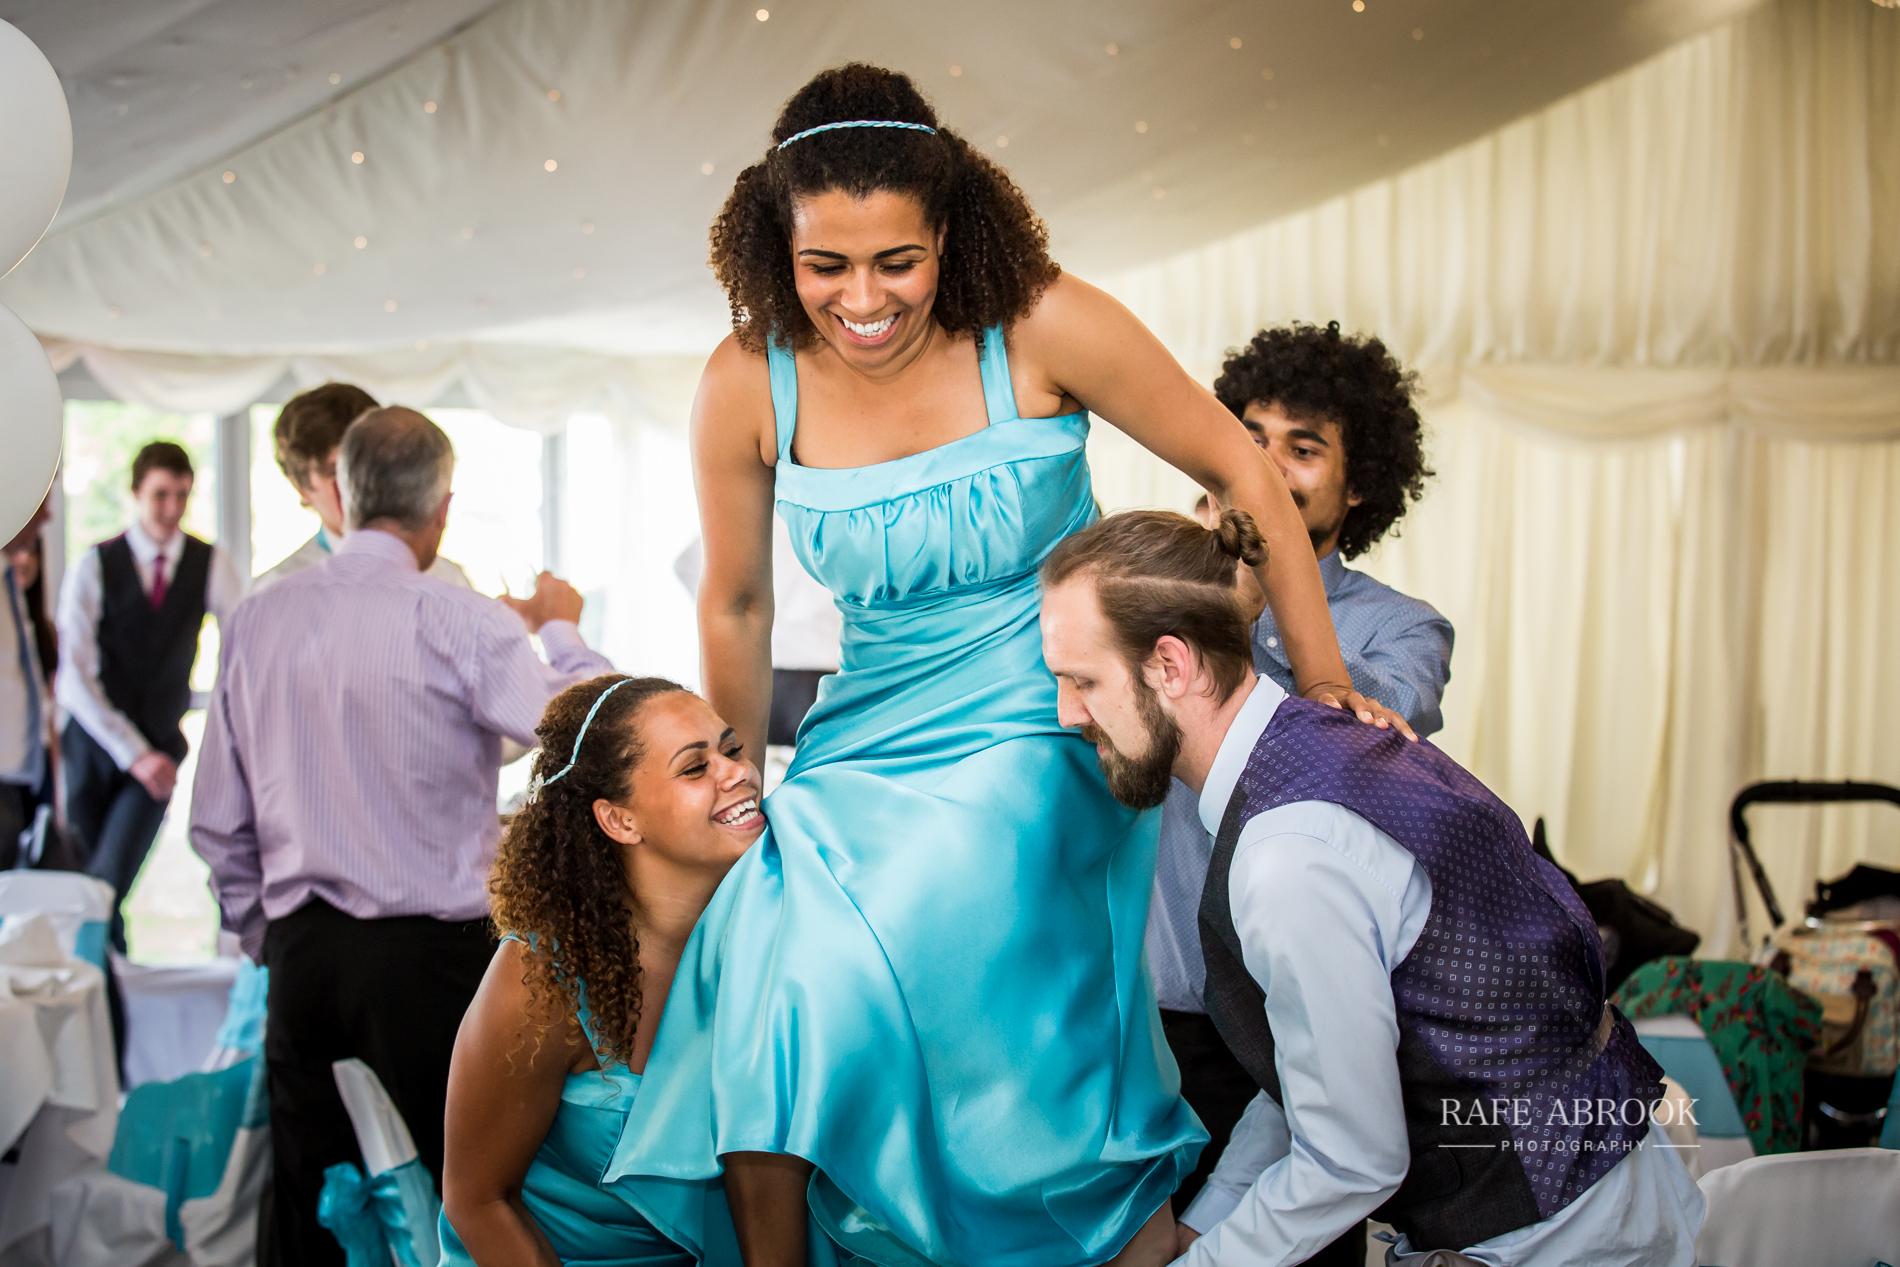 wedding photographer hertfordshire noke thistle hotel st albans -1405.jpg